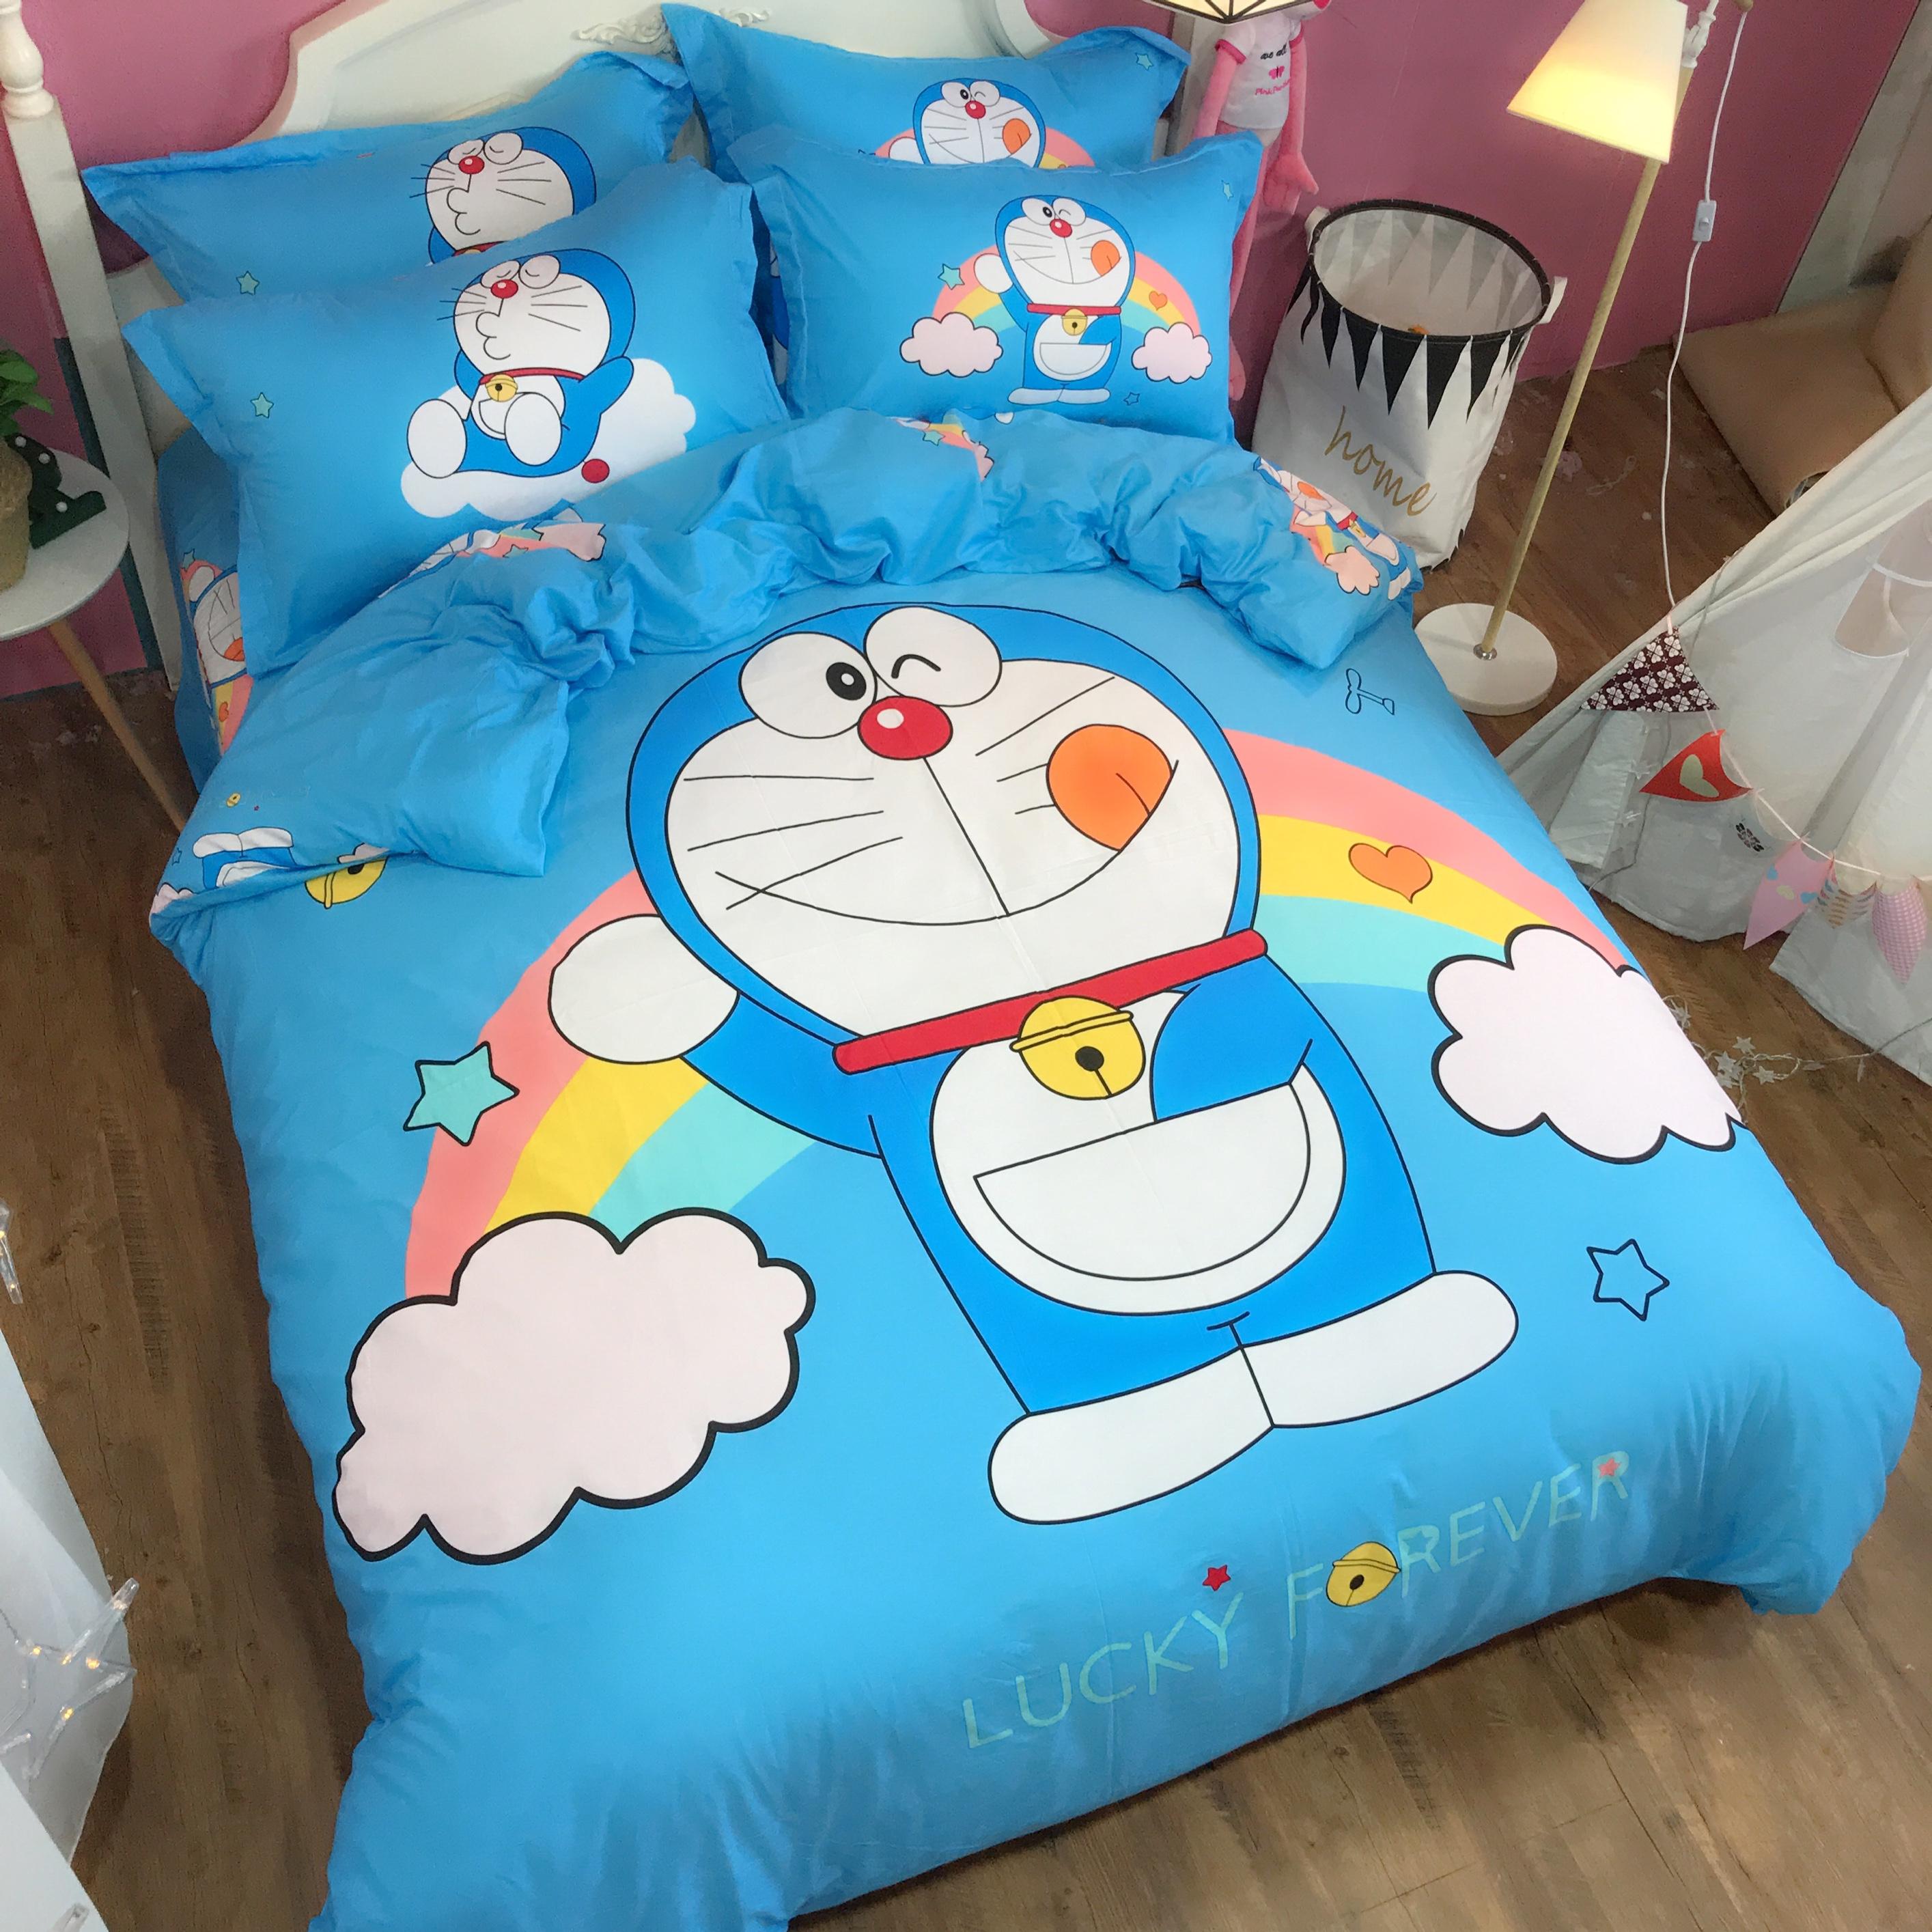 sports shoes b2f64 bfbf7 Cartoon Pokonyan Doraemon 100% Cotton Printed Fabric Children 3pcs  Wholesale Luxury Comforter Home Kids Bedding Set - Buy Bedding Set,100%  Cotton ...